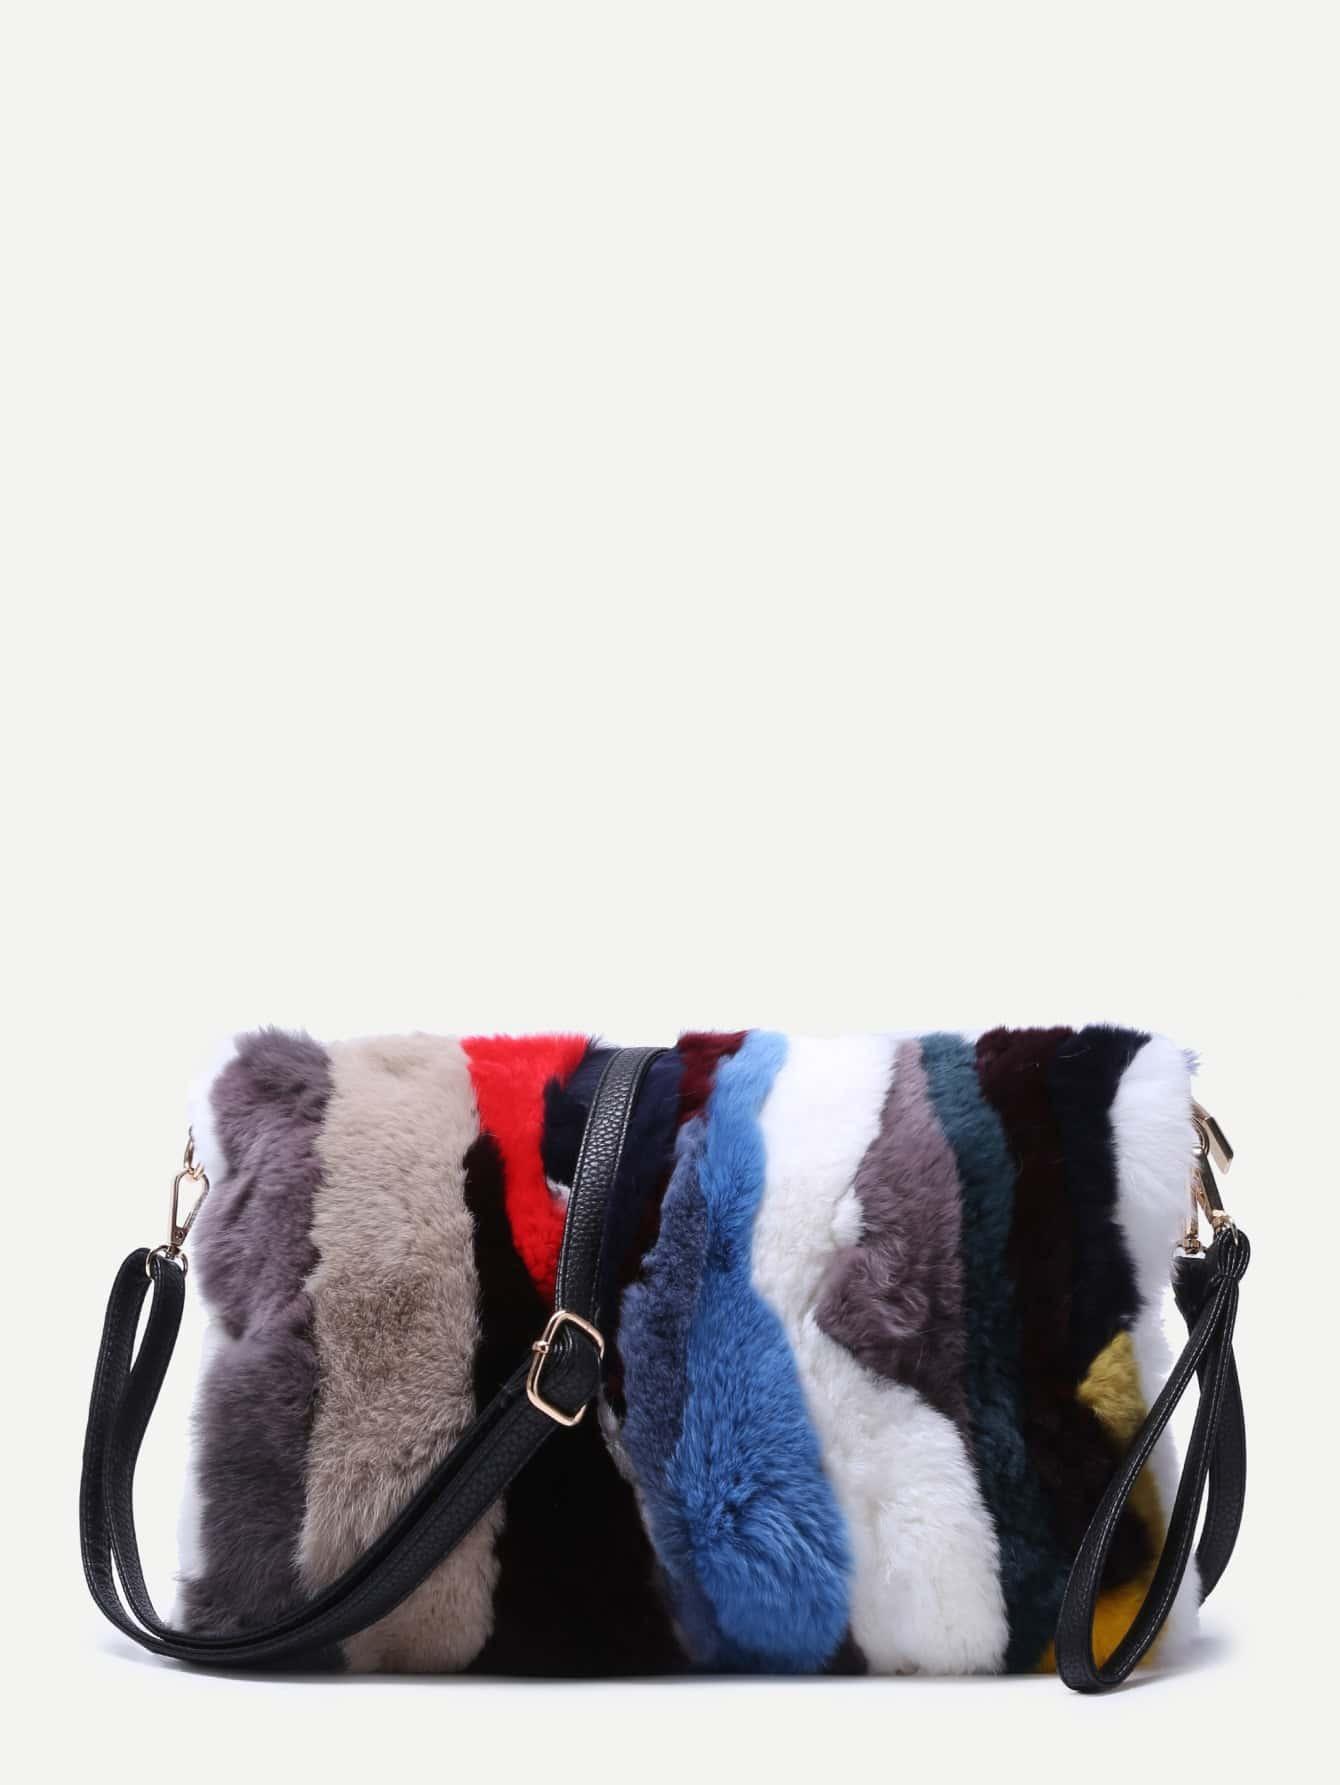 Color Block Vertical Striped Rabbit Fur Shoulder BagColor Block Vertical Striped Rabbit Fur Shoulder Bag<br><br>color: Multi<br>size: None